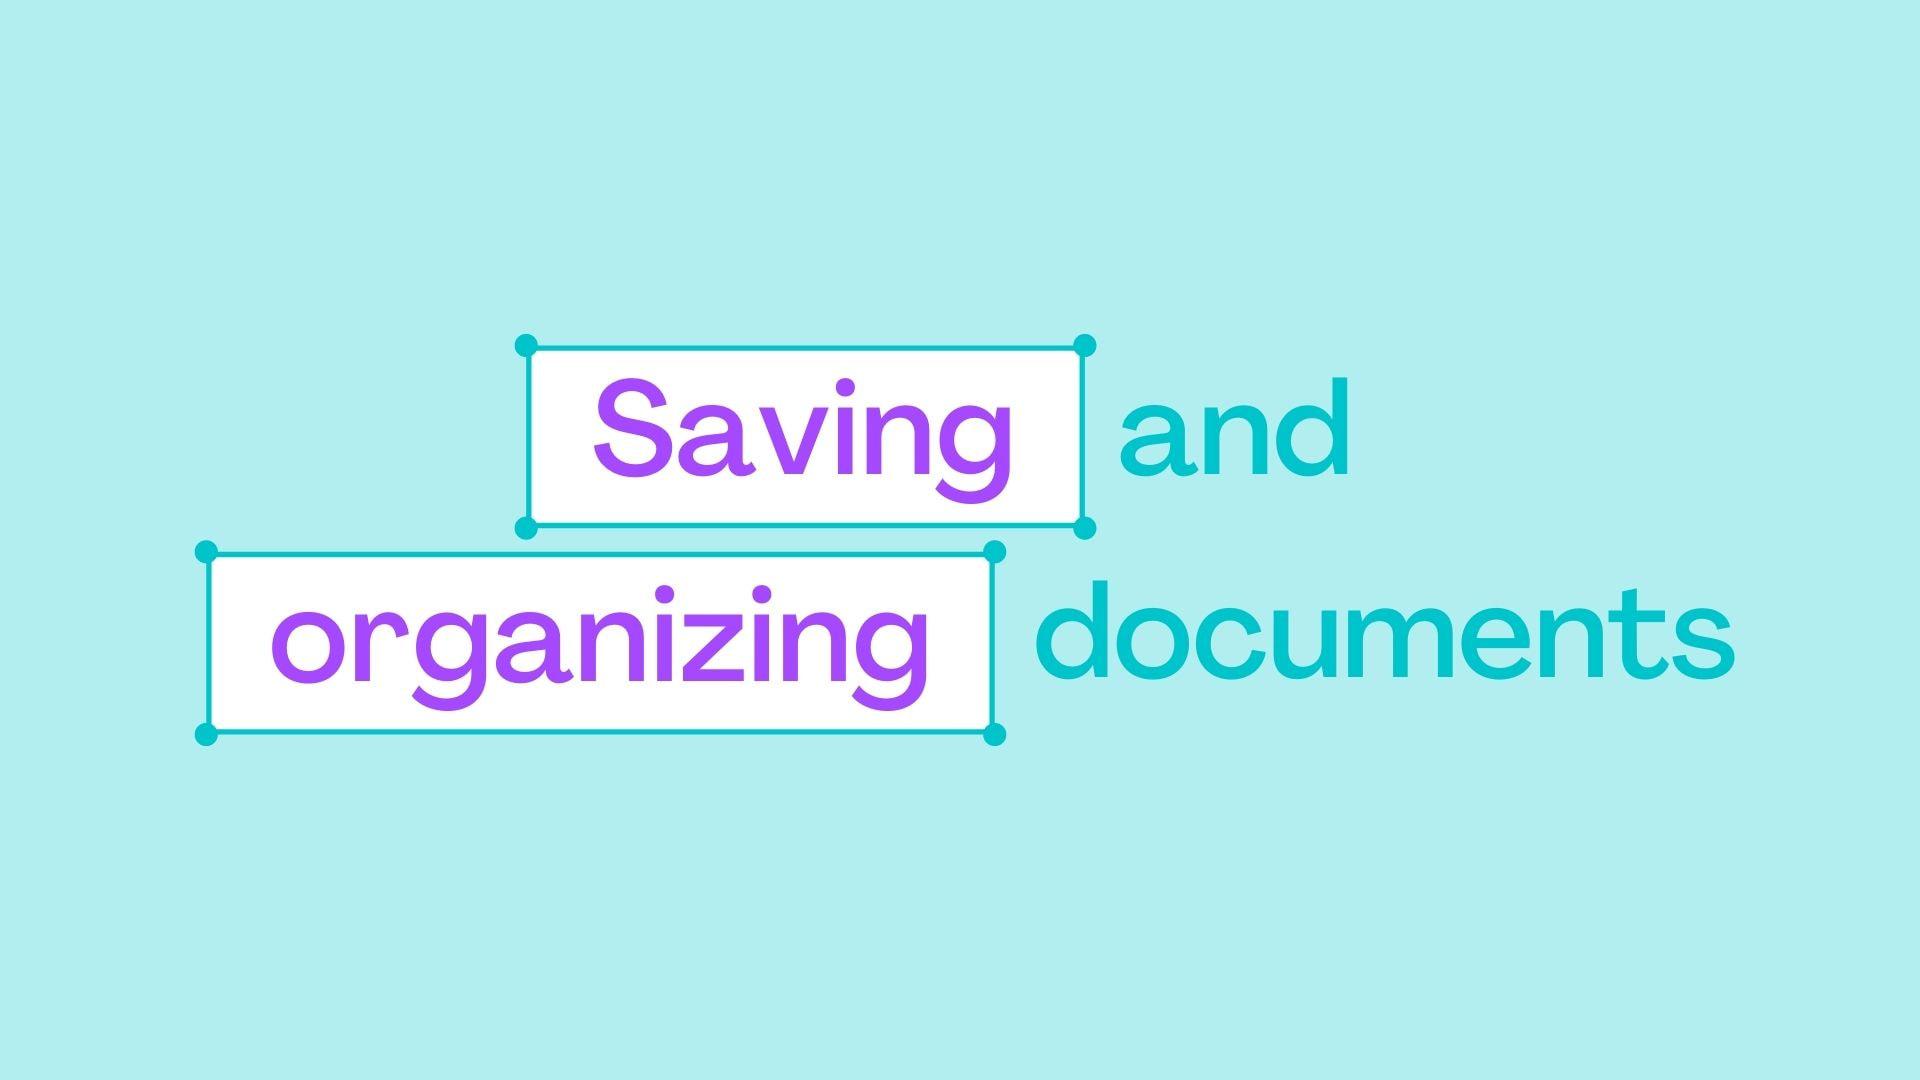 1.9 Saving and organizing documents